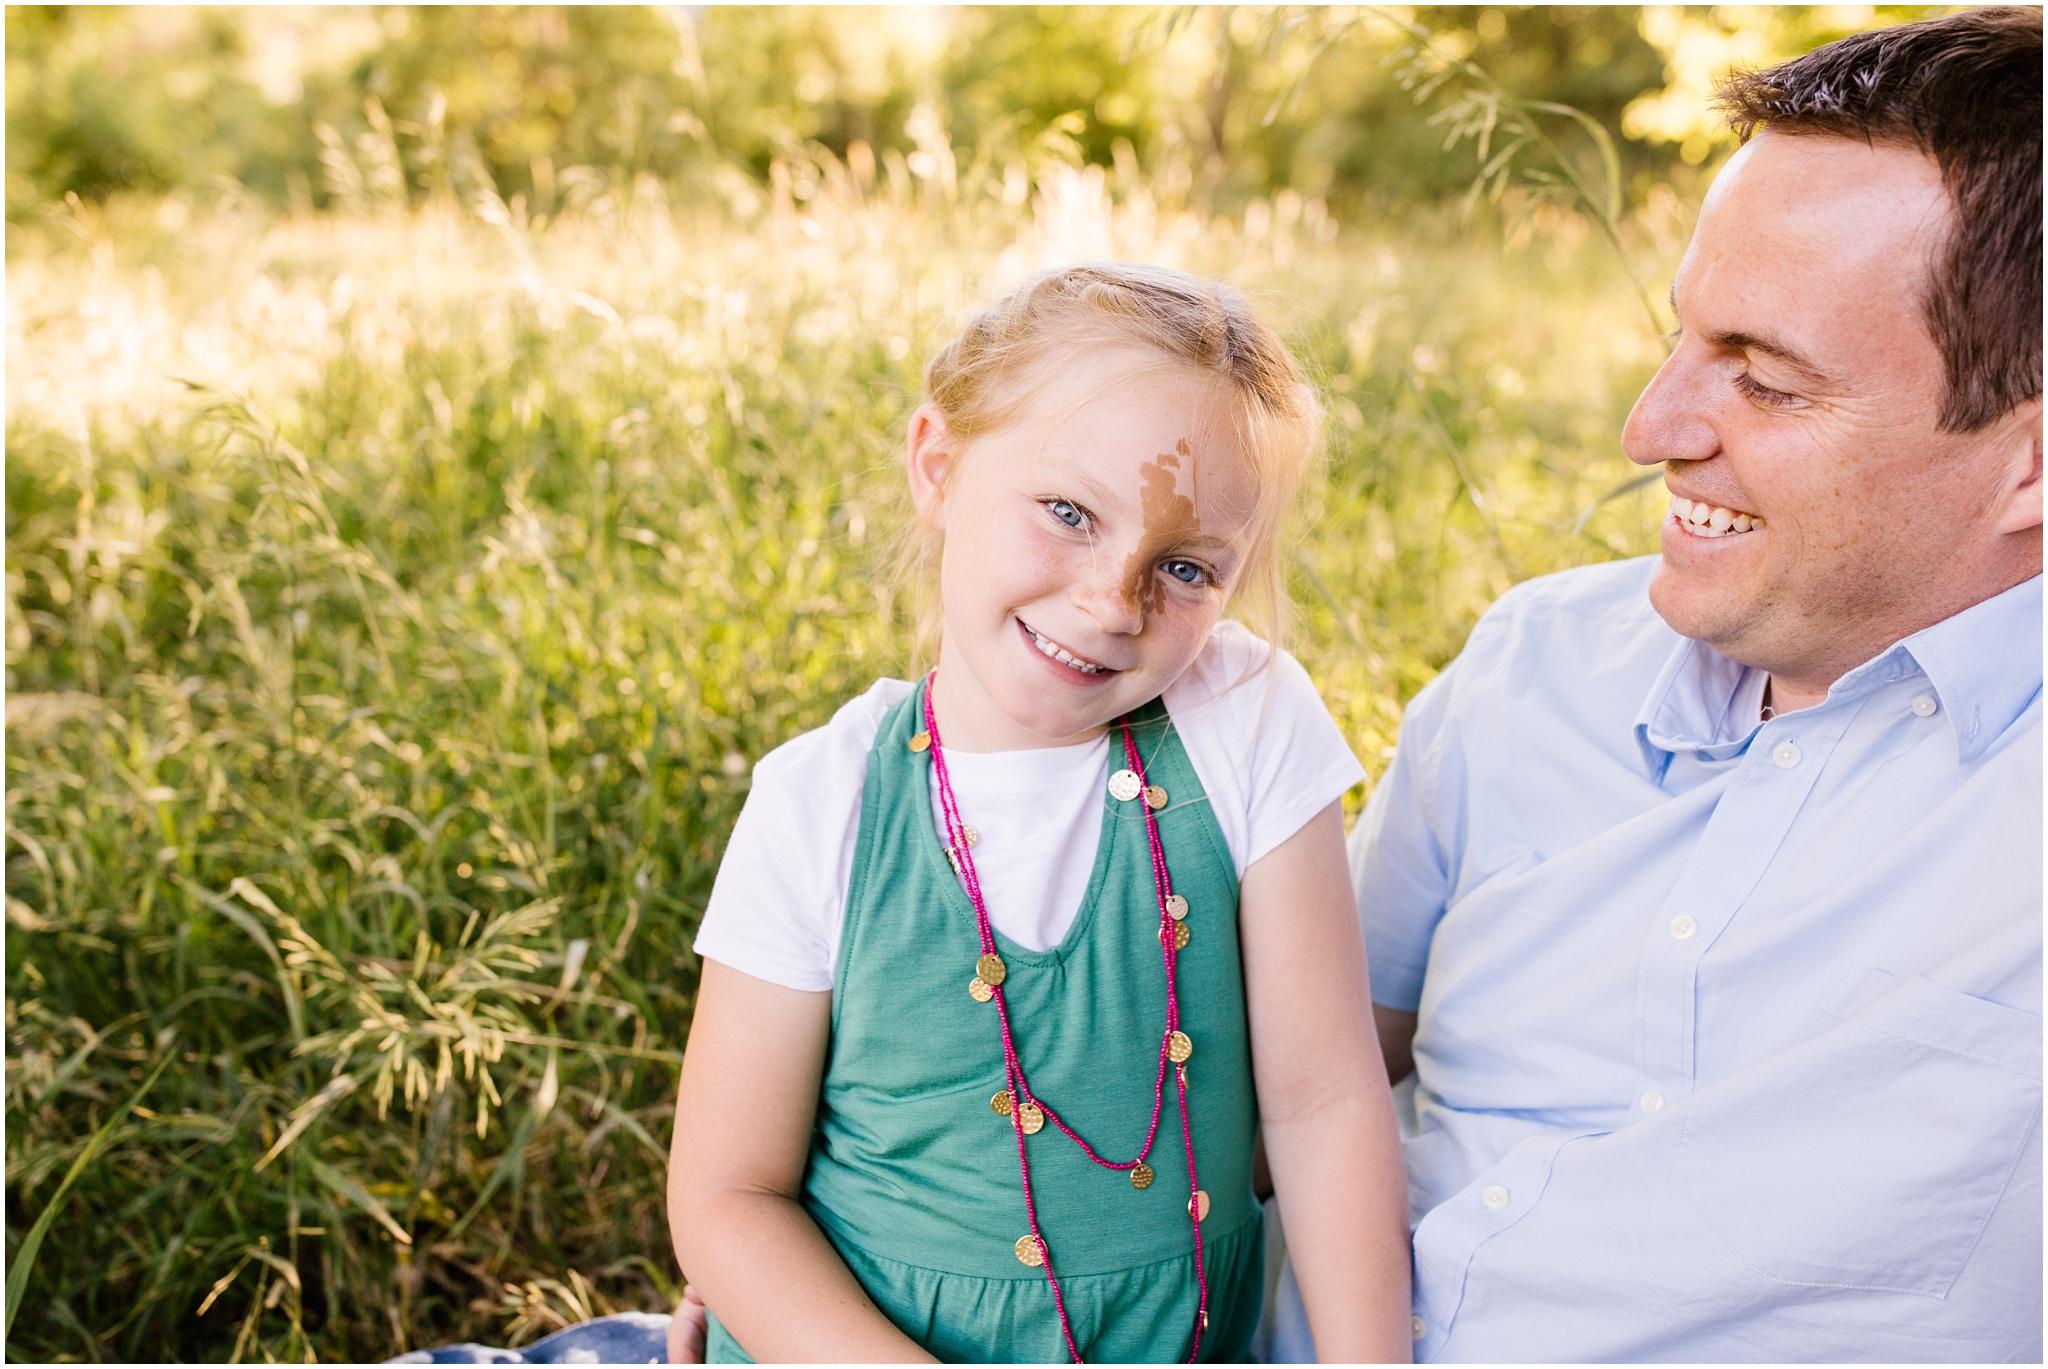 Lizzie-B-Imagery-Utah-Family-Photographer-Utah-County-Photographer-Hobble-Creek-Canyon_0004.jpg